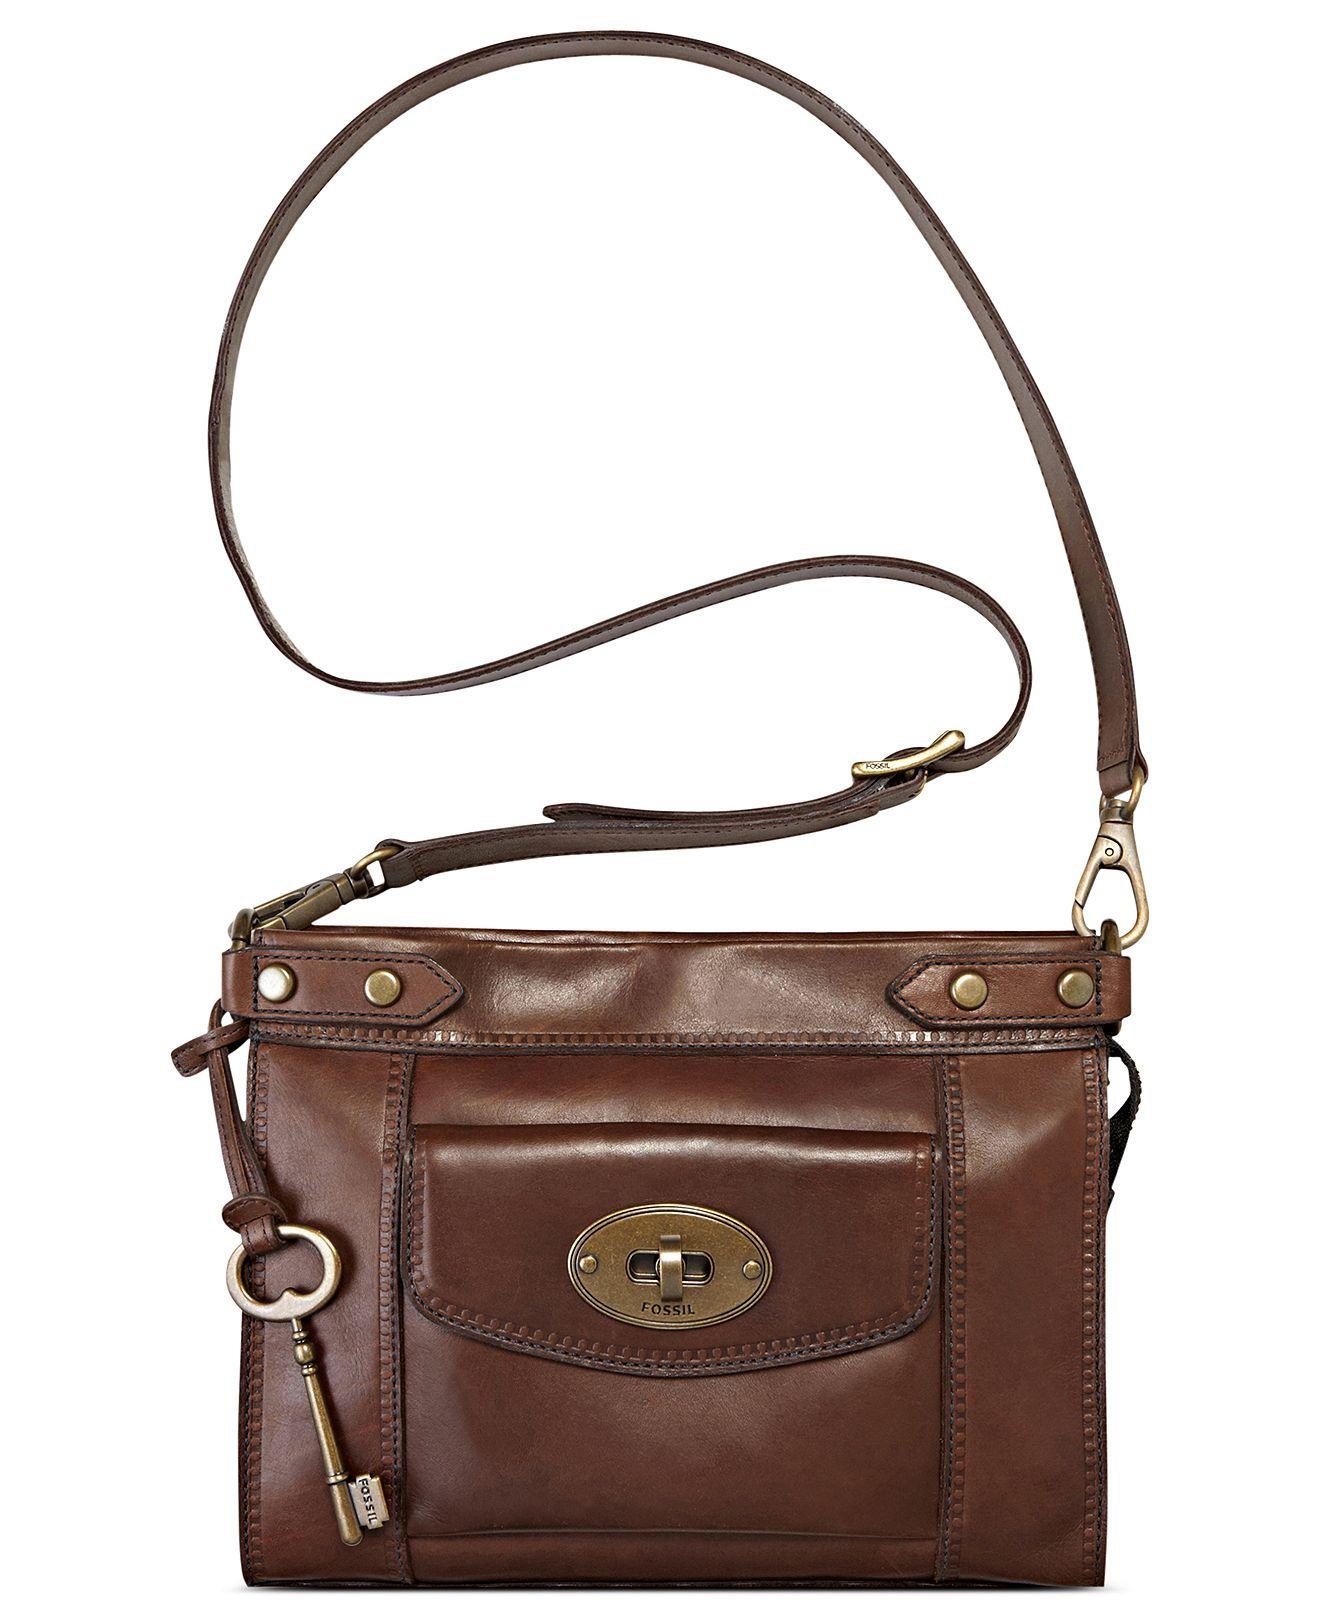 Fossil Handbag Vintage Revival Convertible Leather Crossbody Handbags Accessories